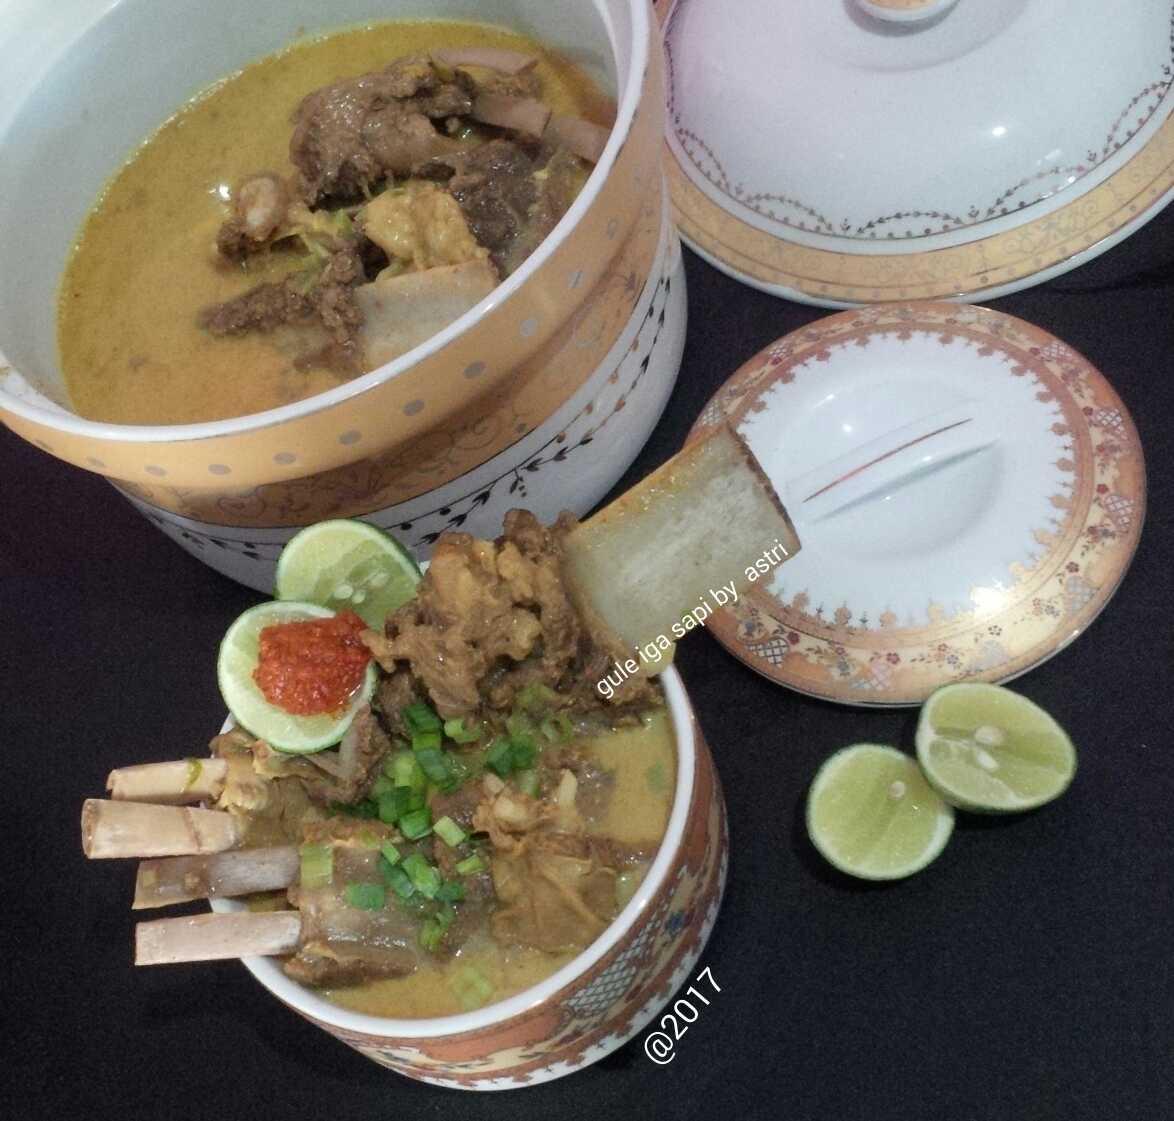 Creamy Cakery 2017 Sambel 200gr By Dapur Liwet Ui Gulai Iga Sapi Request My Lovely Husband